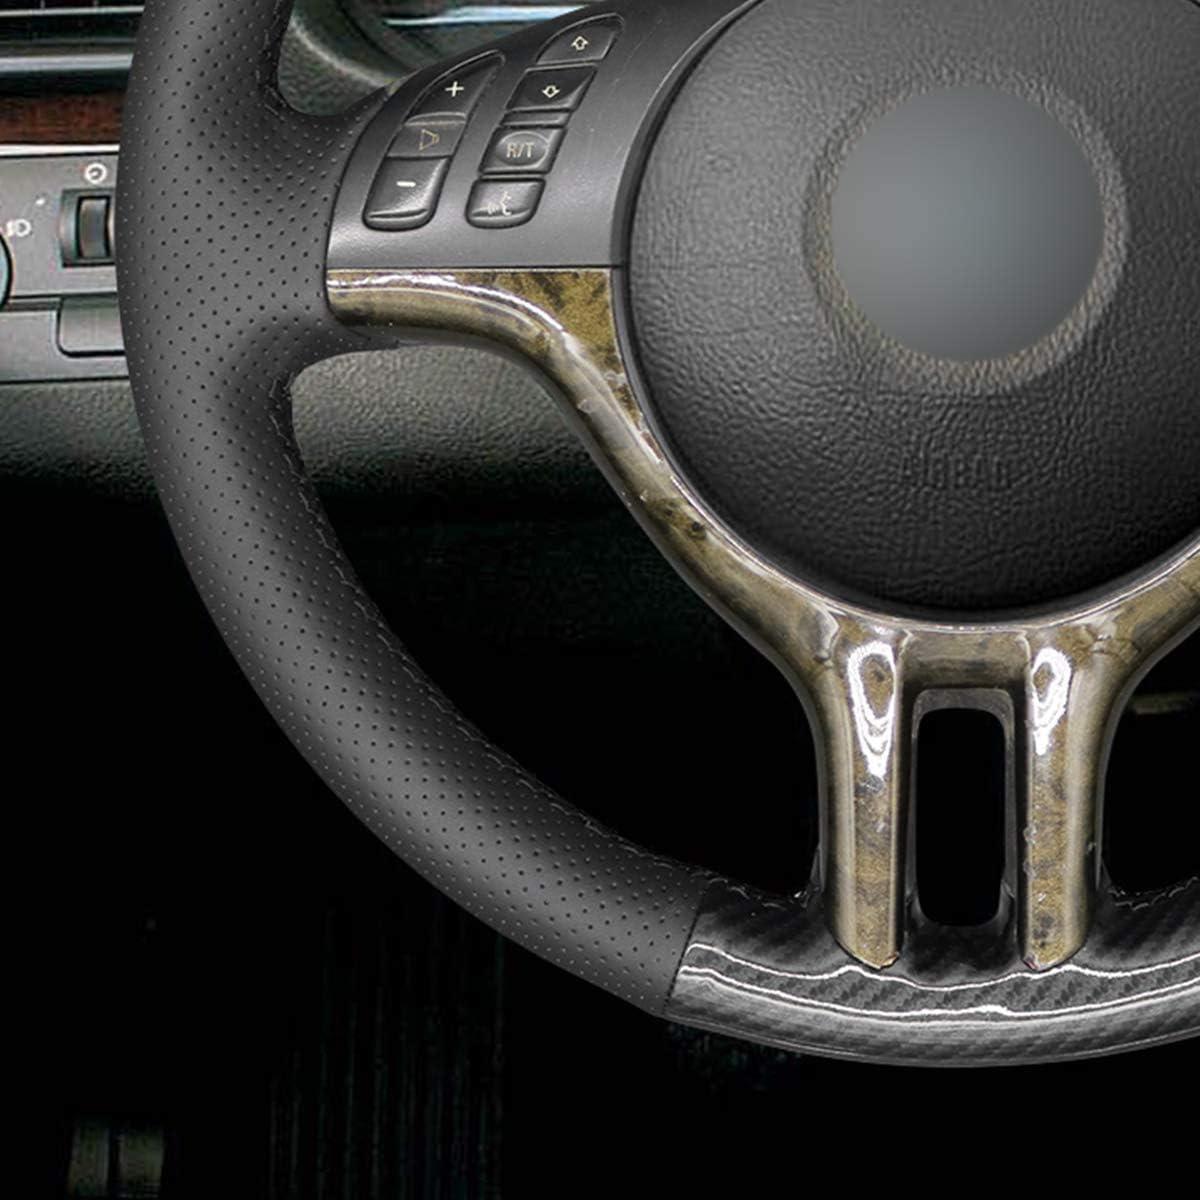 MEWANT Cubierta Del Volante Personalizada Hecha De Cuero Aut/éntico para E39 E46 325i E53 X5